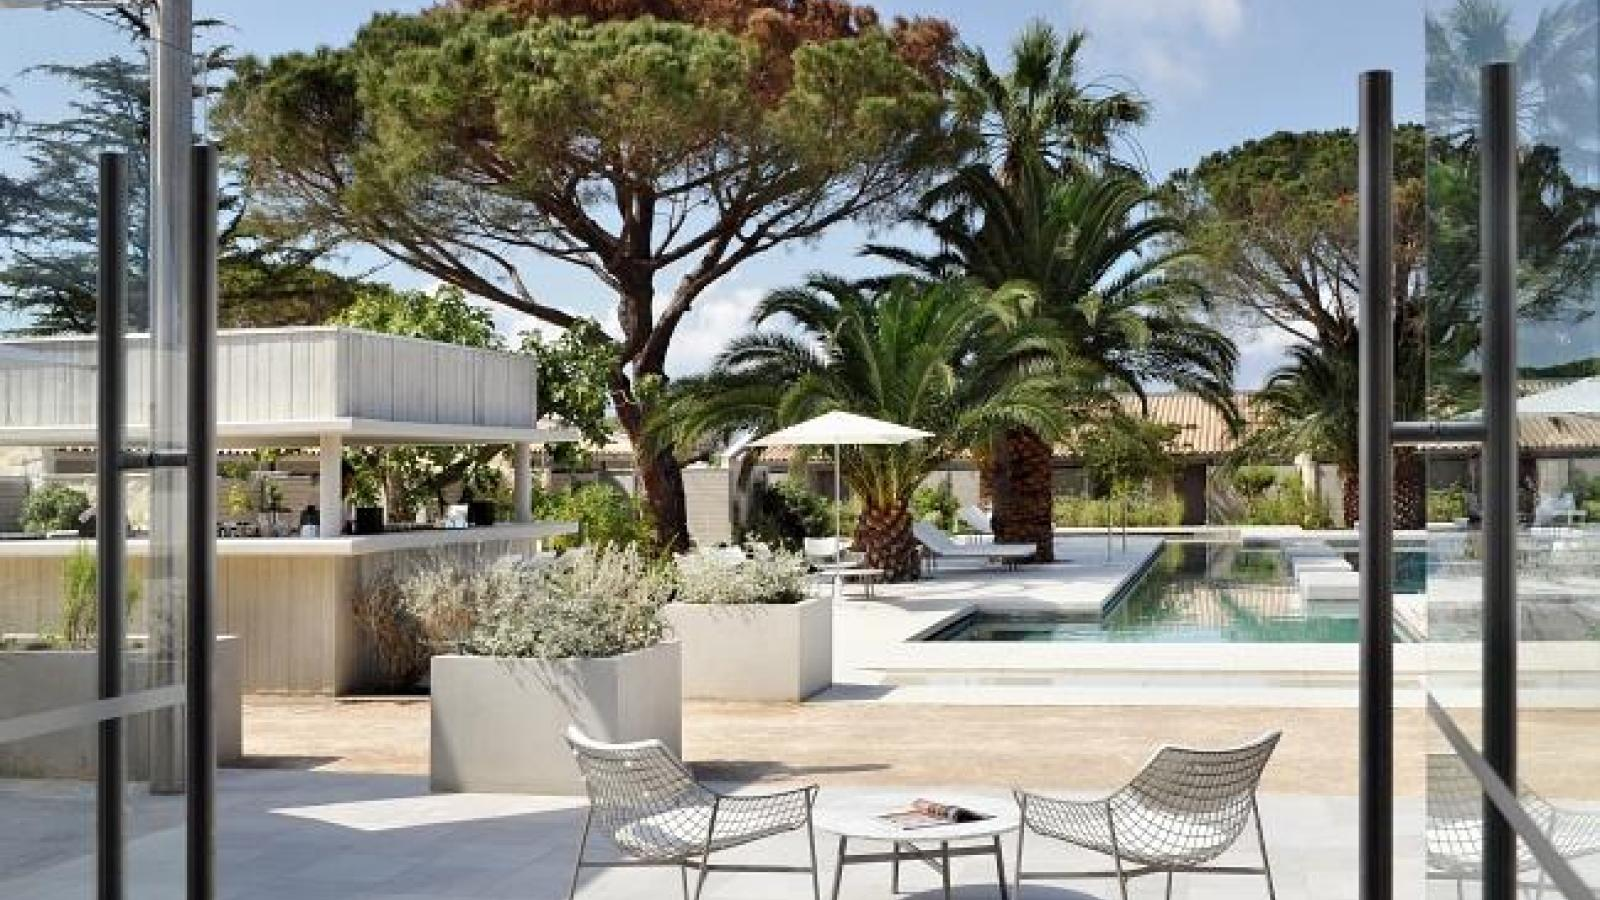 Sezz St Tropez: a dream destination for 5 wonderful years